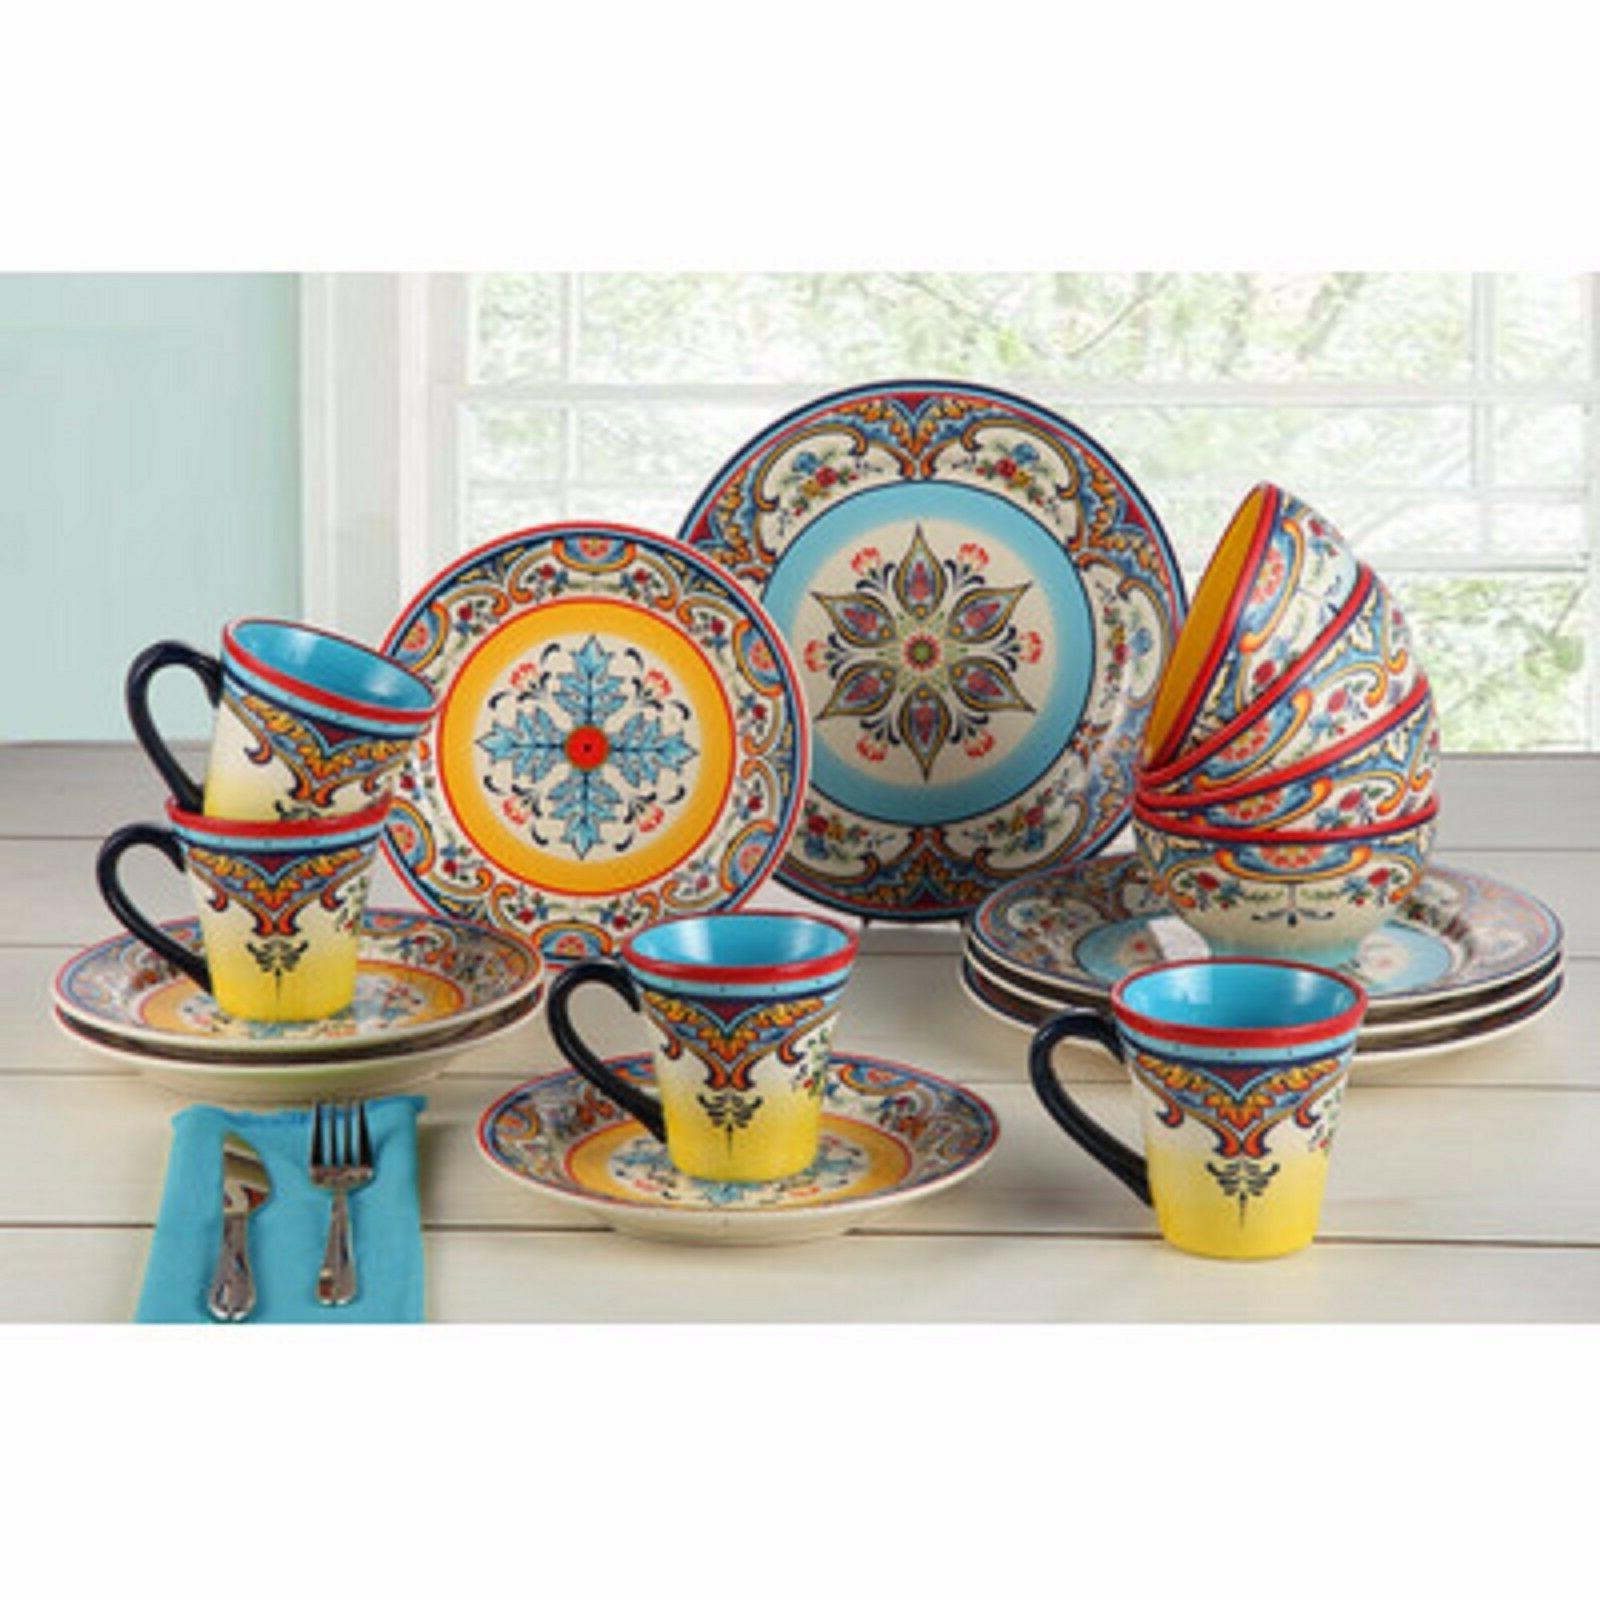 Dinnerware Set by Zanzibar Dishes Plates Cups